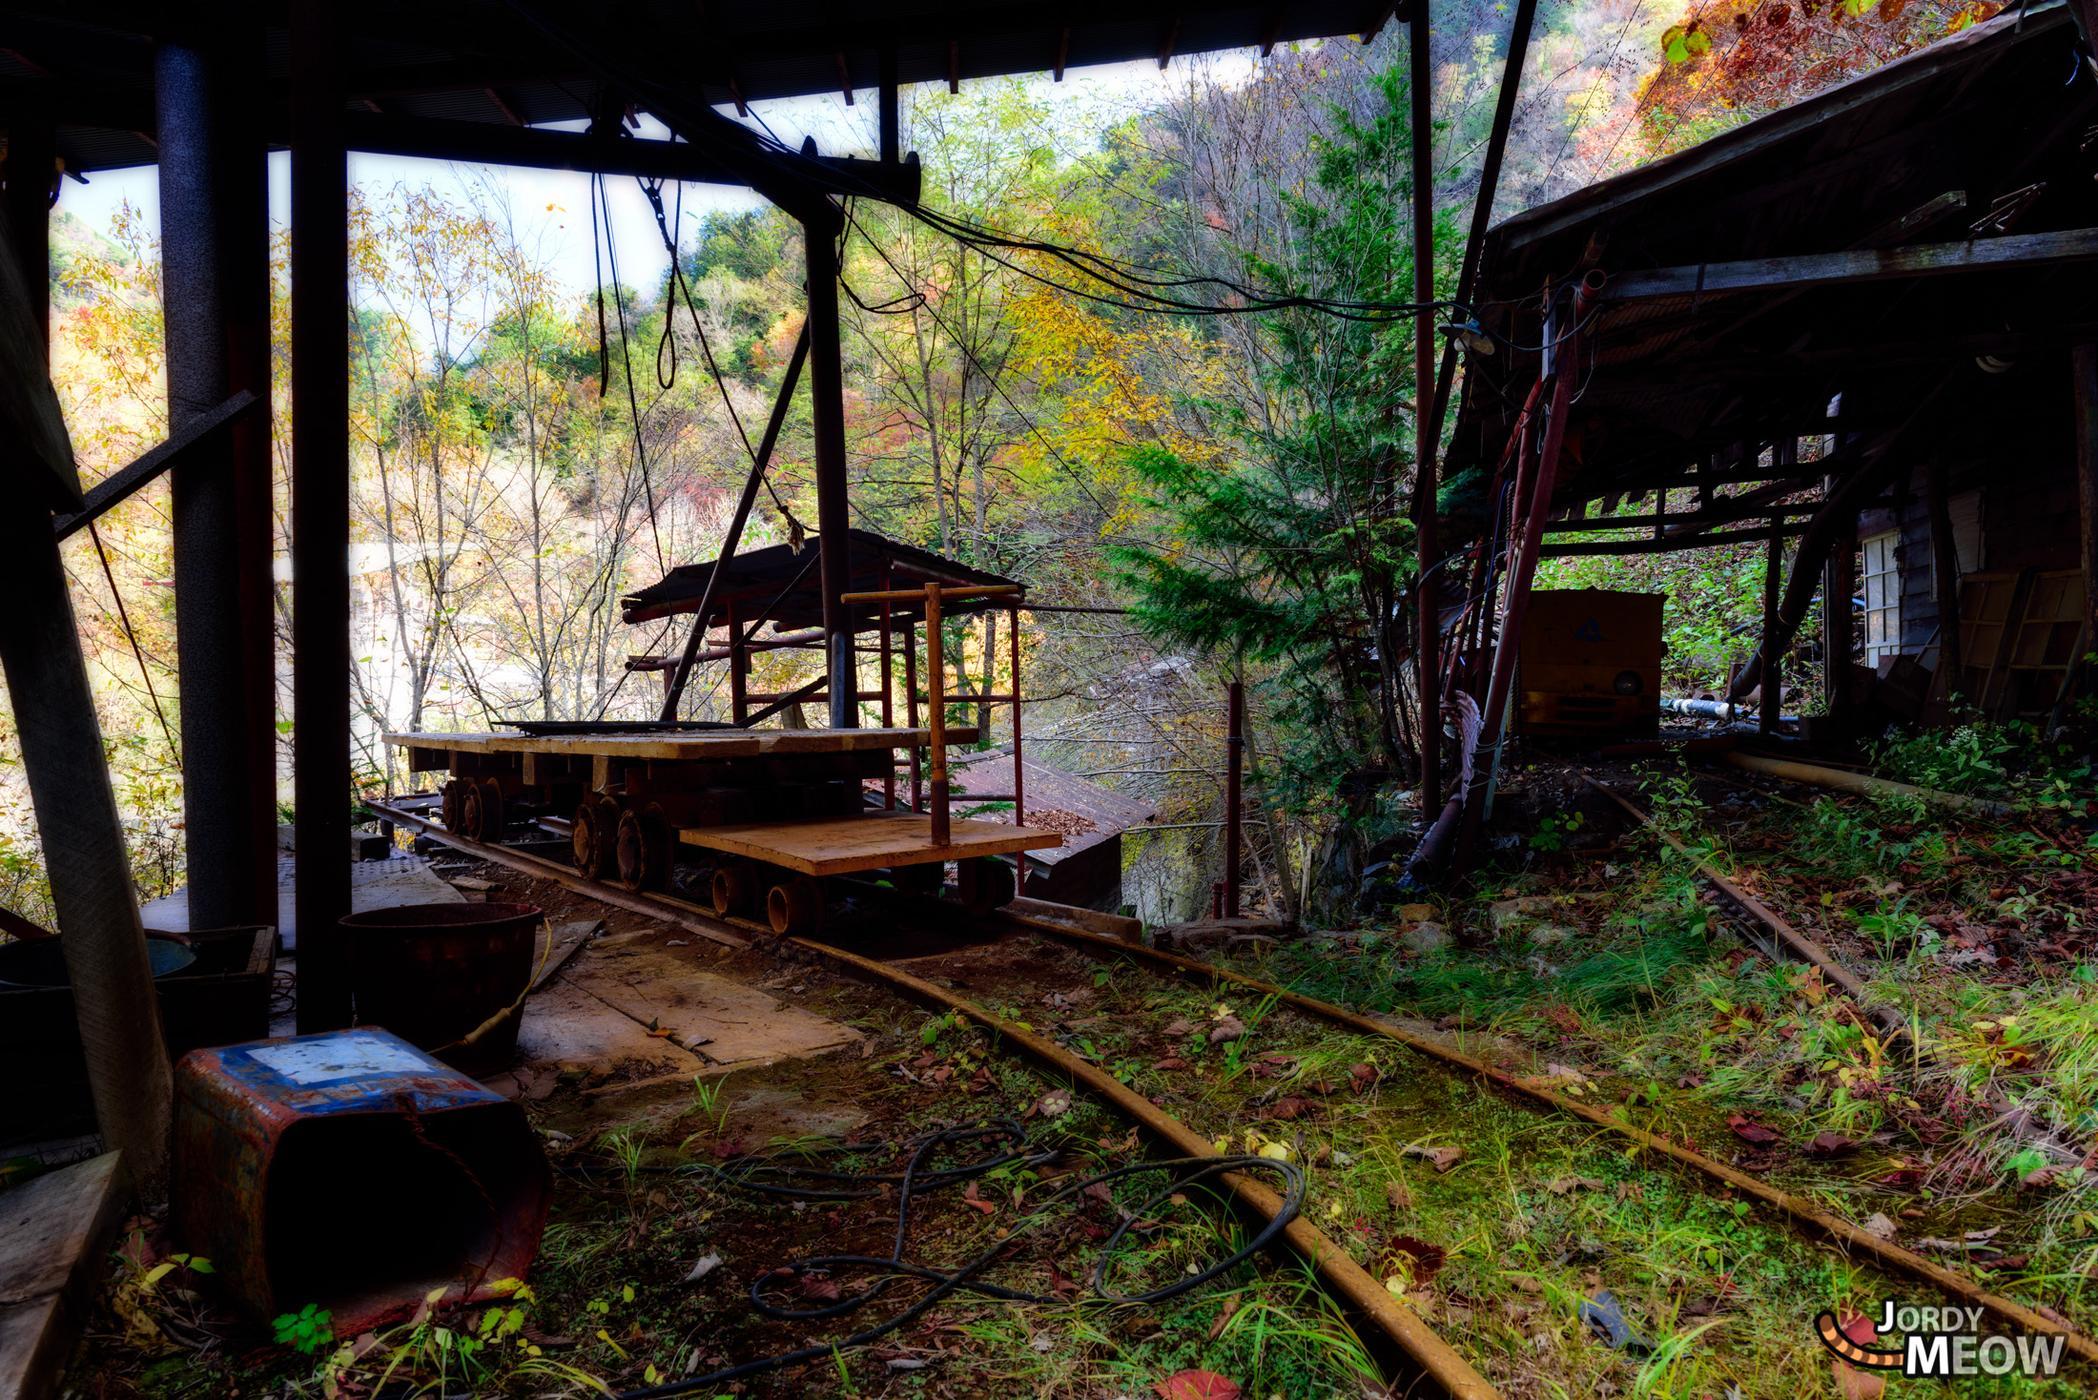 abandoned, chichibu, factory, haikyo, japan, japanese, kanto, mine, ruin, saitama, urban exploration, urbex